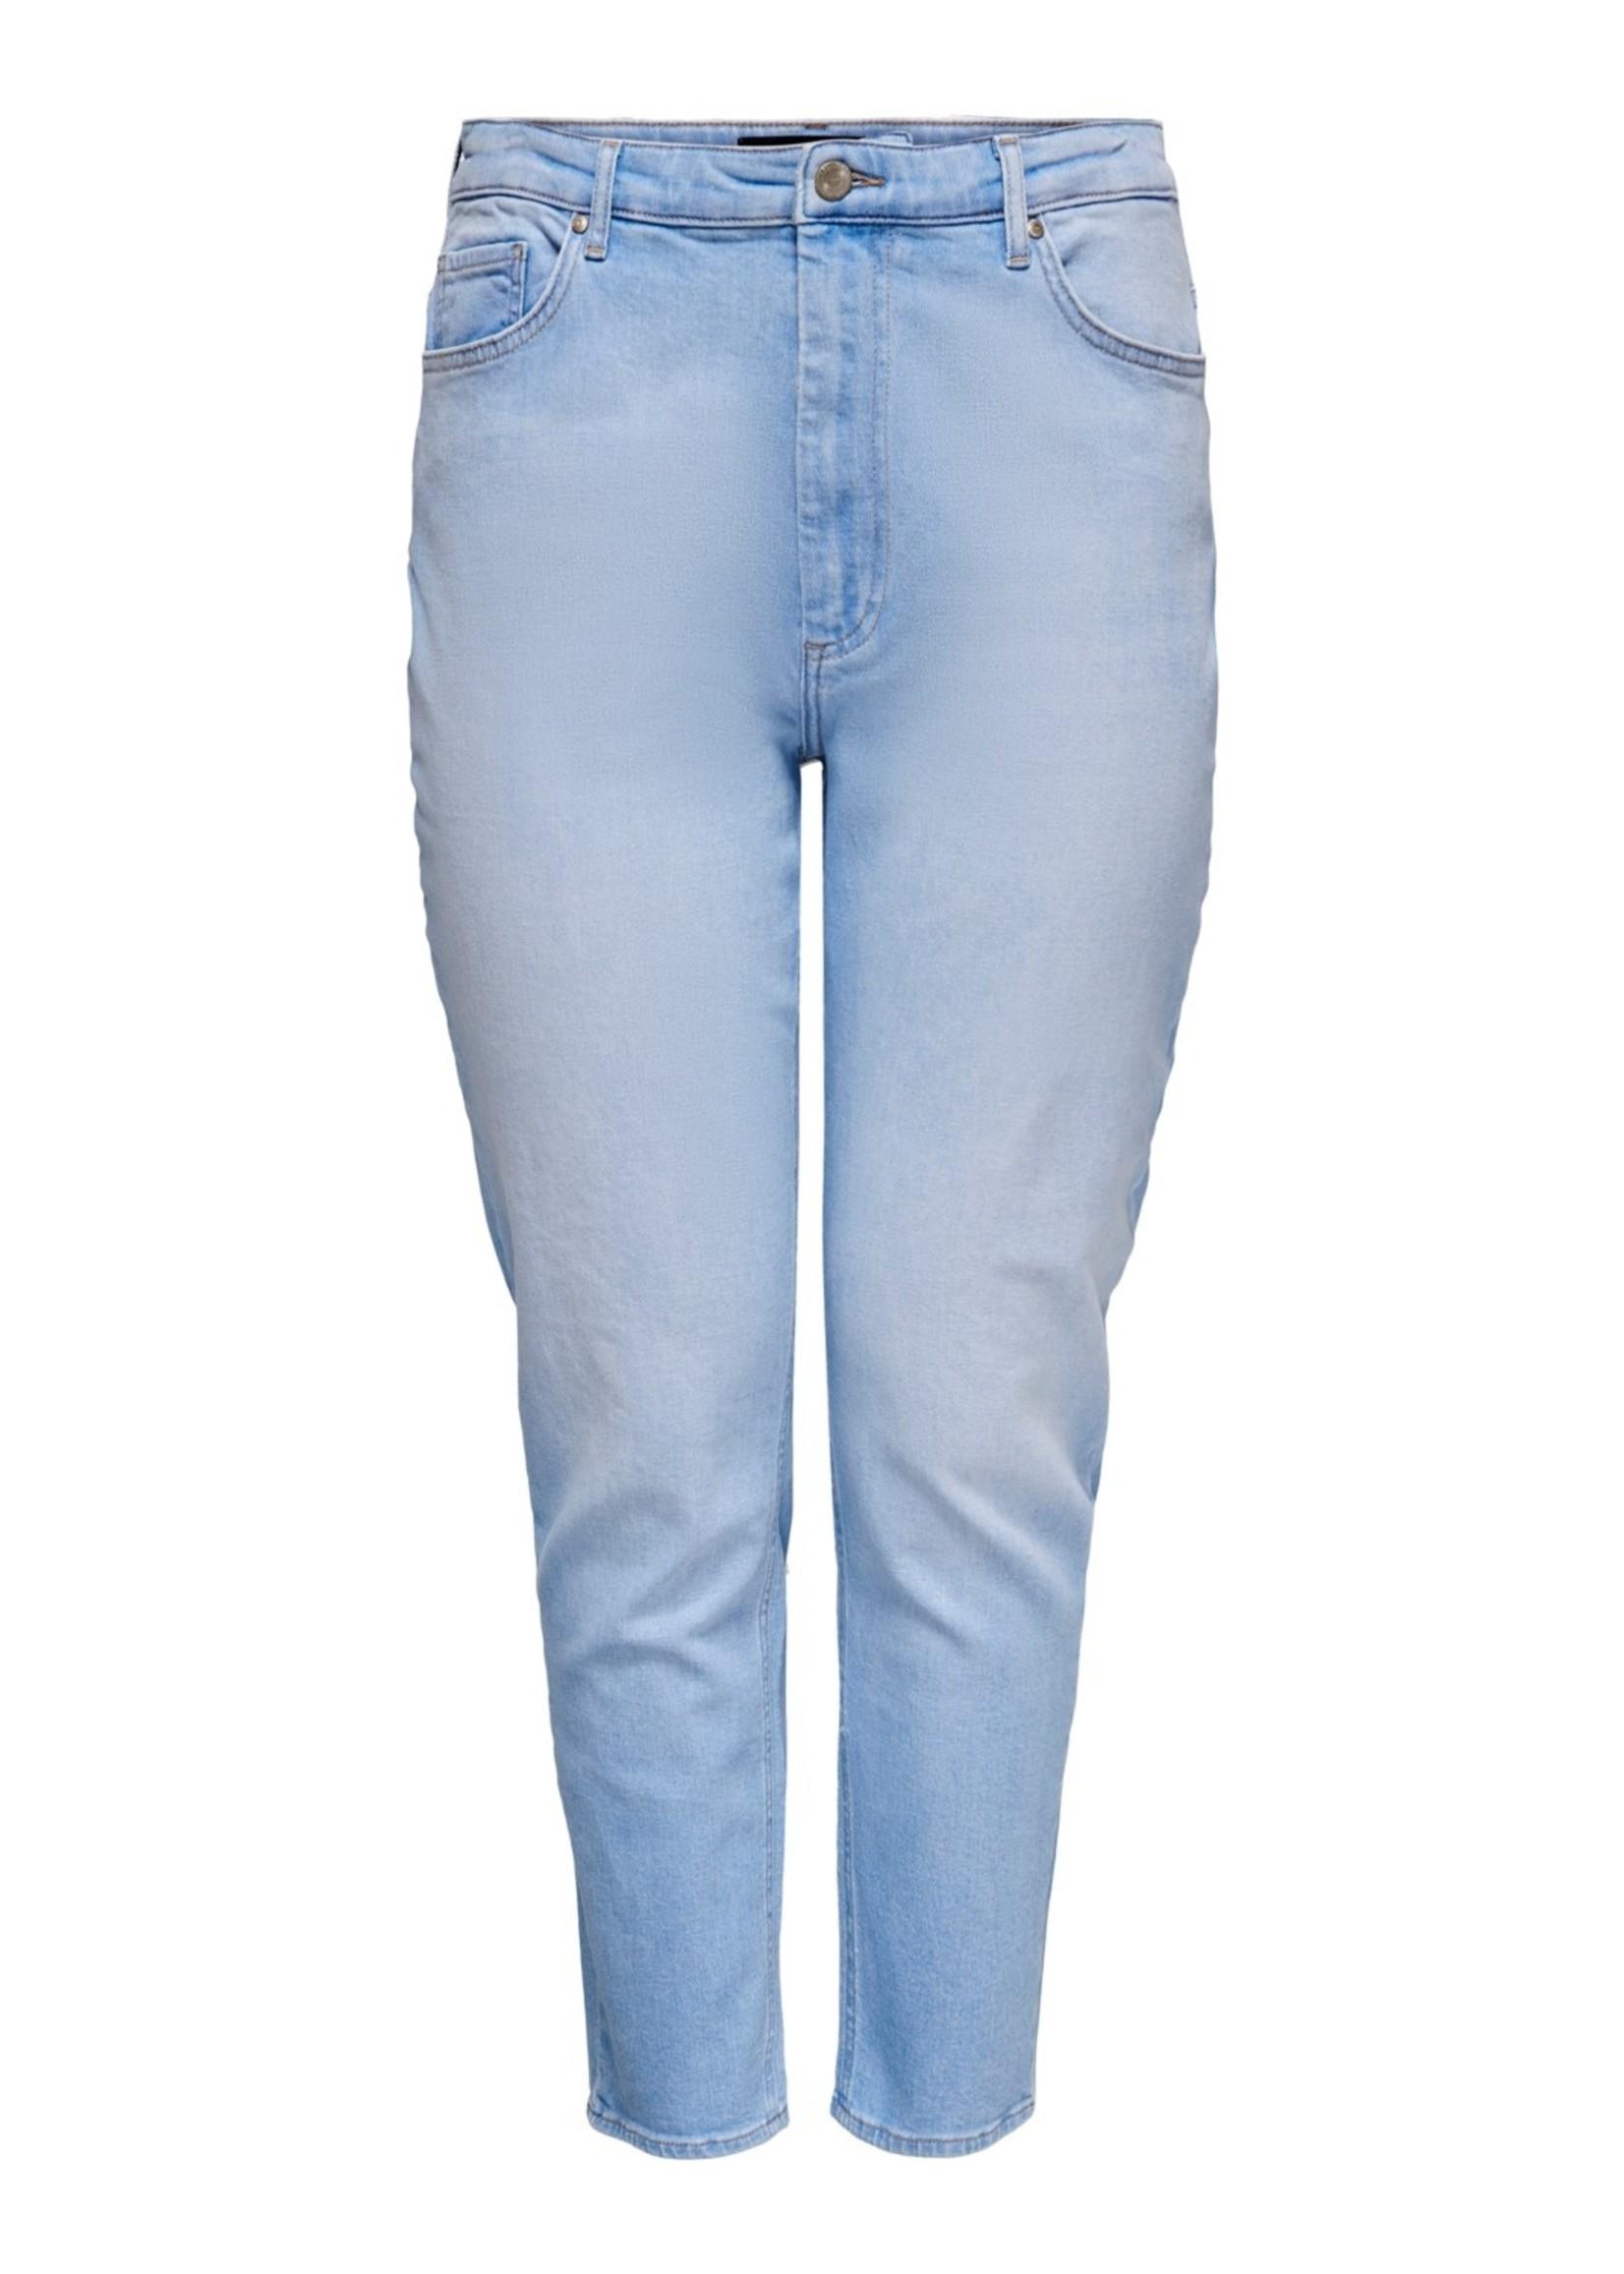 Only Carmakoma Only Carmakoma Eneda Mom Jeans